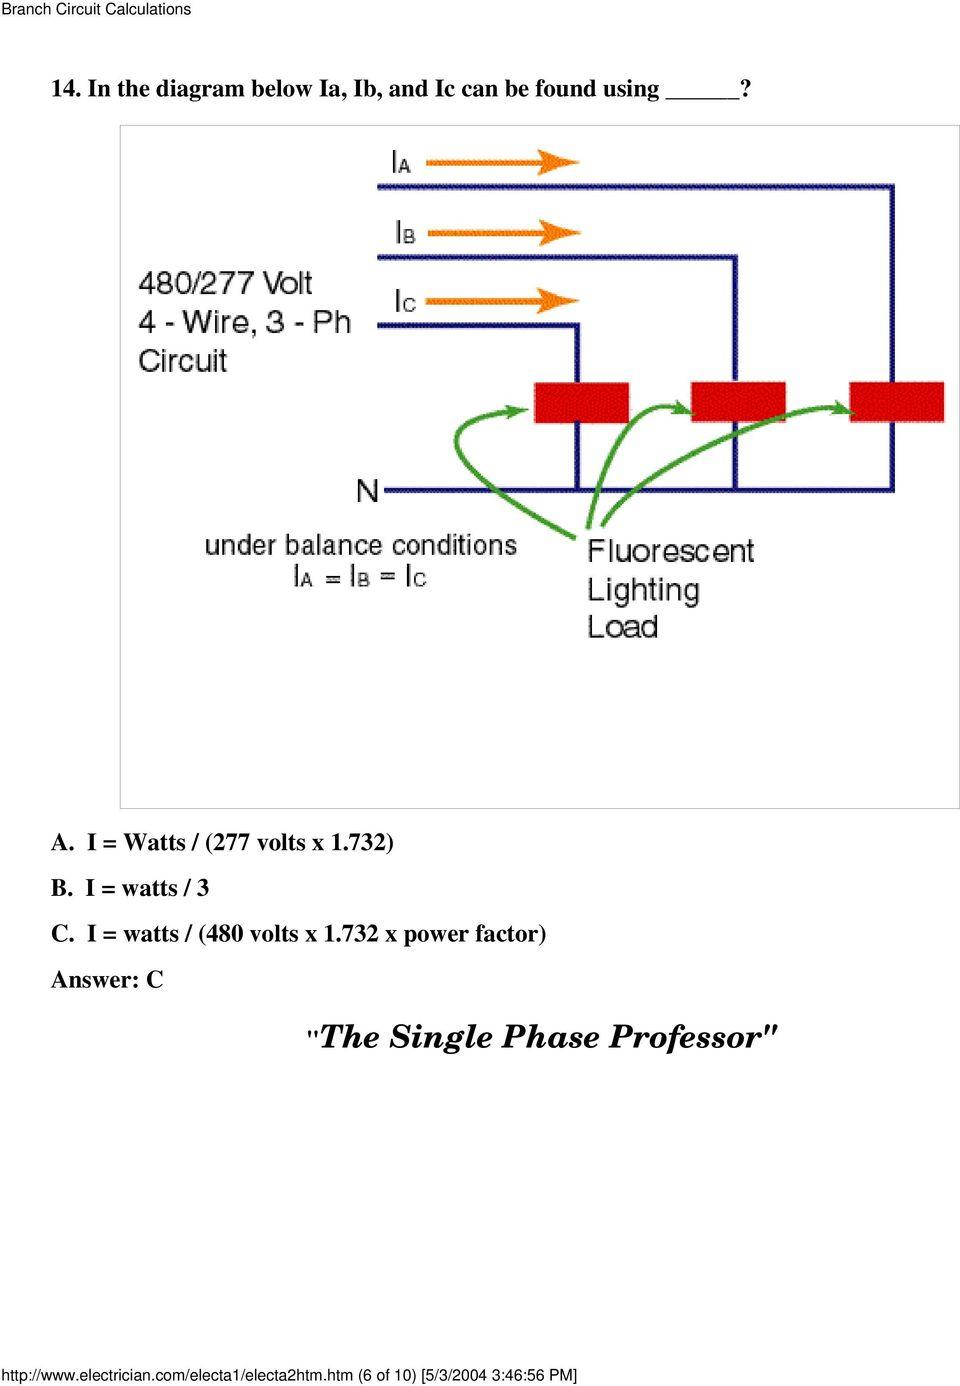 medium resolution of i watts 480 volts x 1